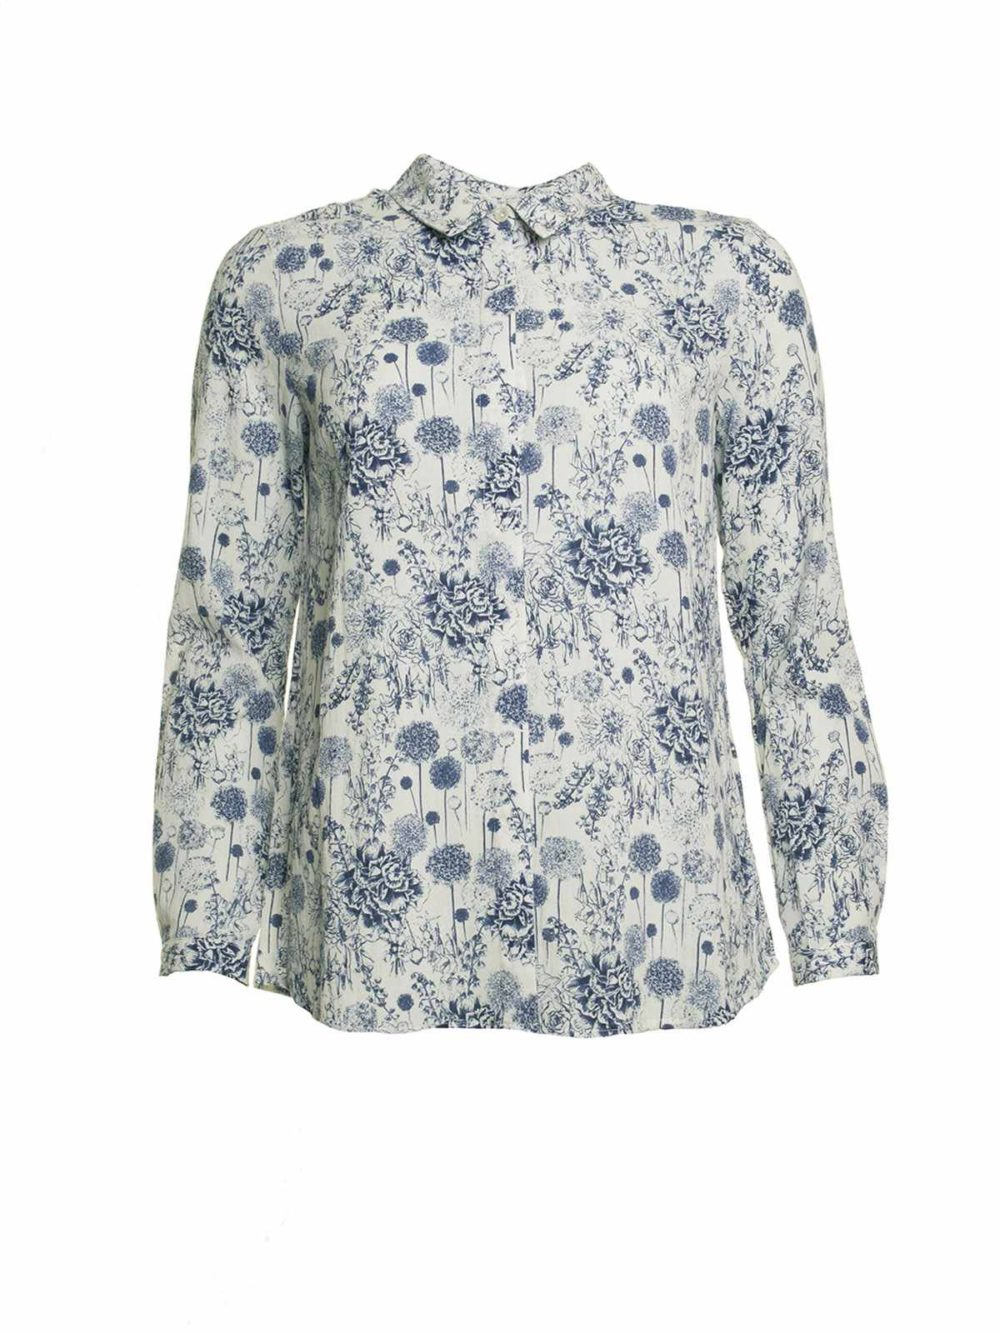 Francoise Shirt Thought Clothing Katie Kerr Women's Clothing